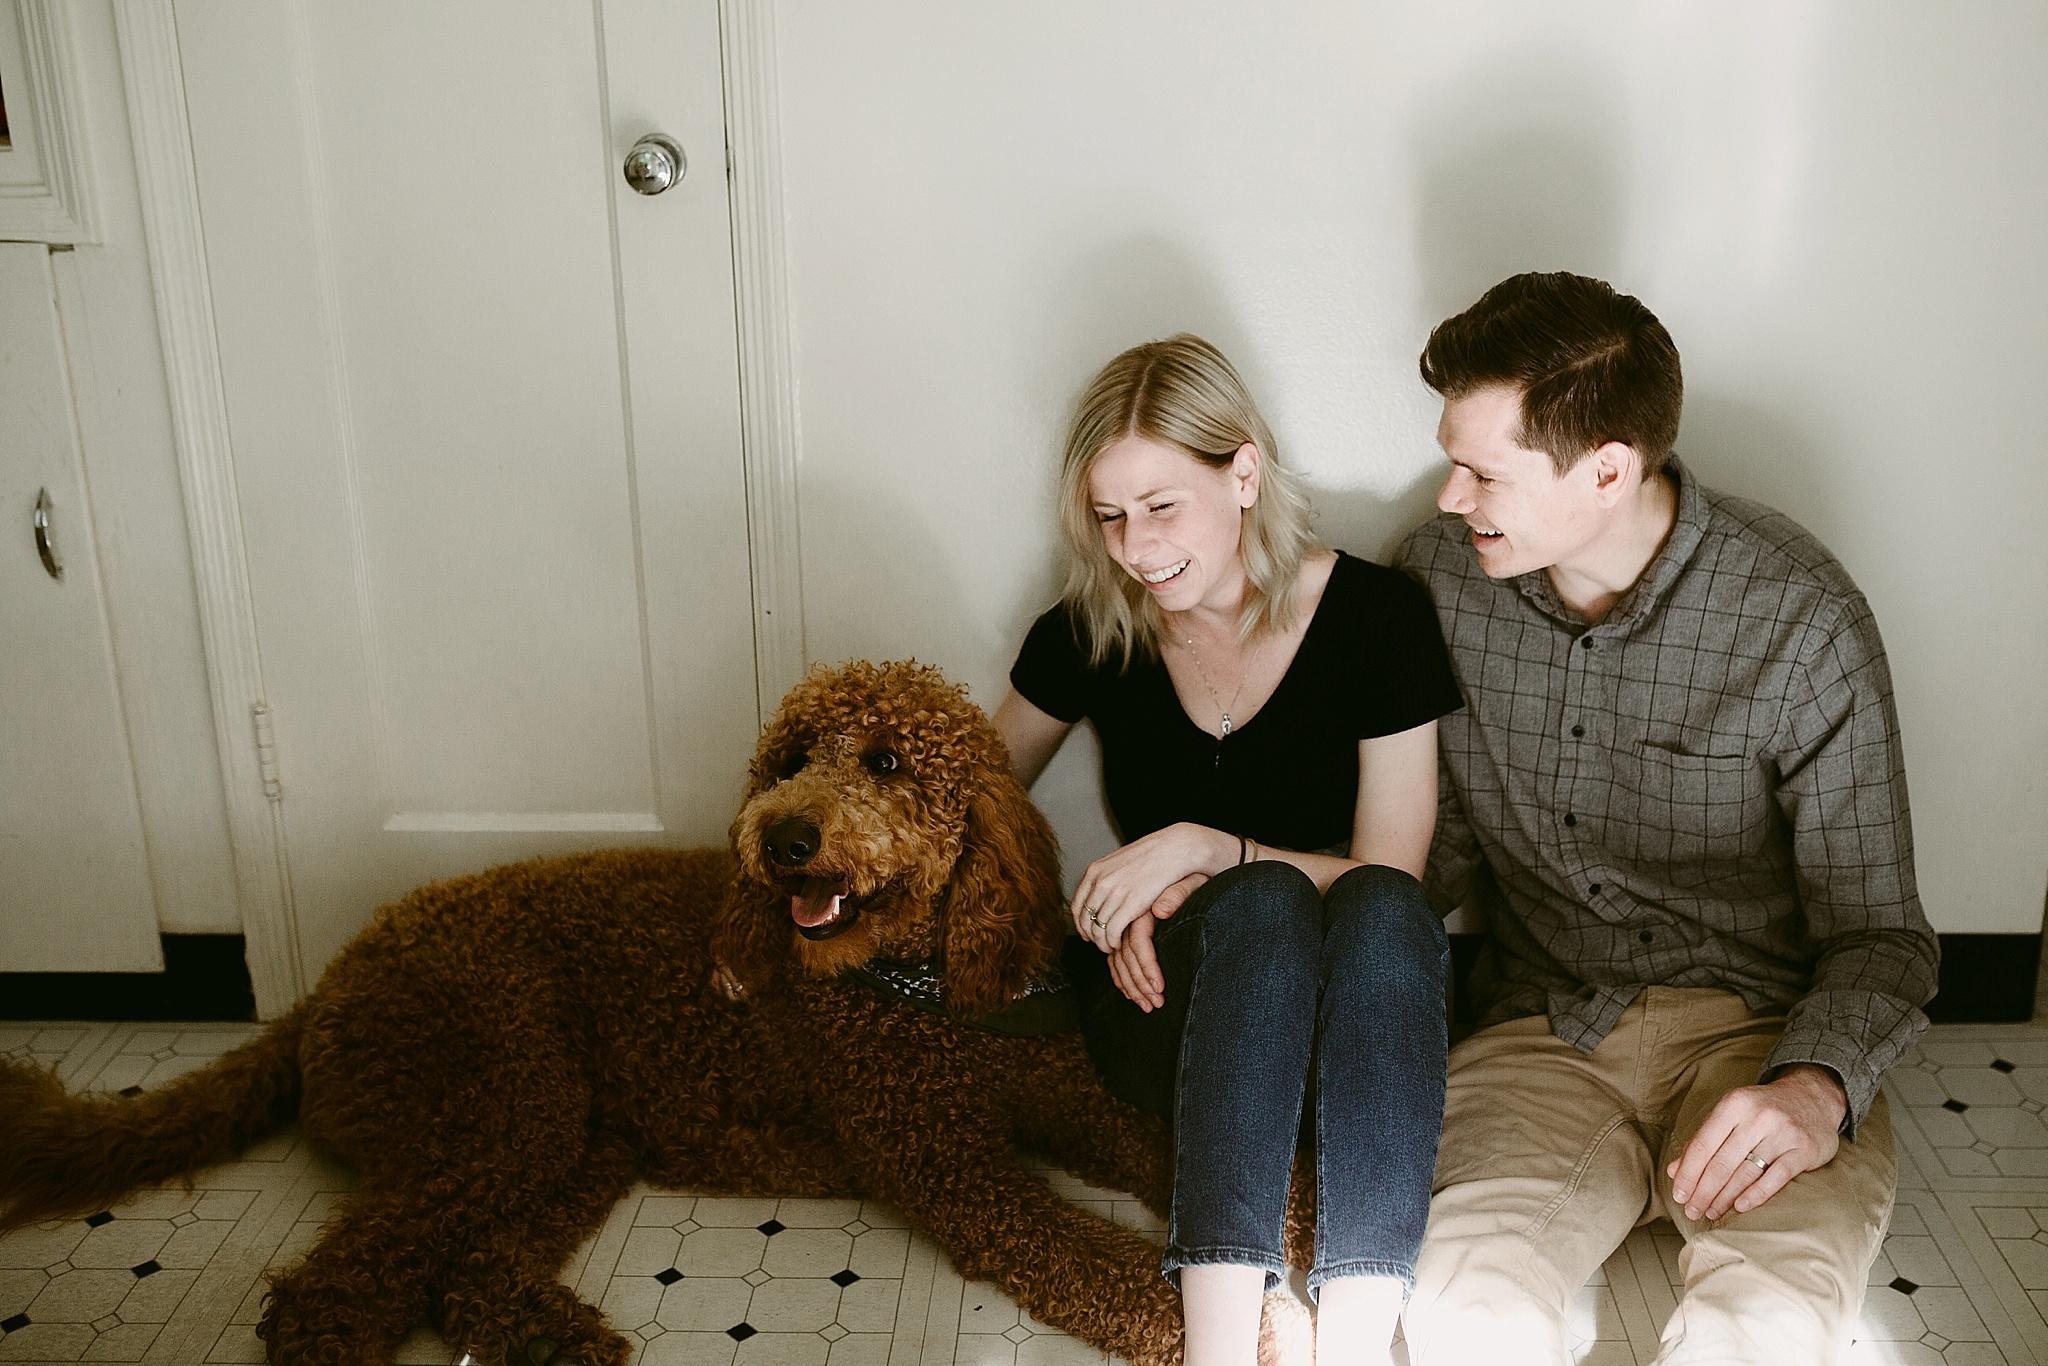 SF Bay Area lifestyle family photographer